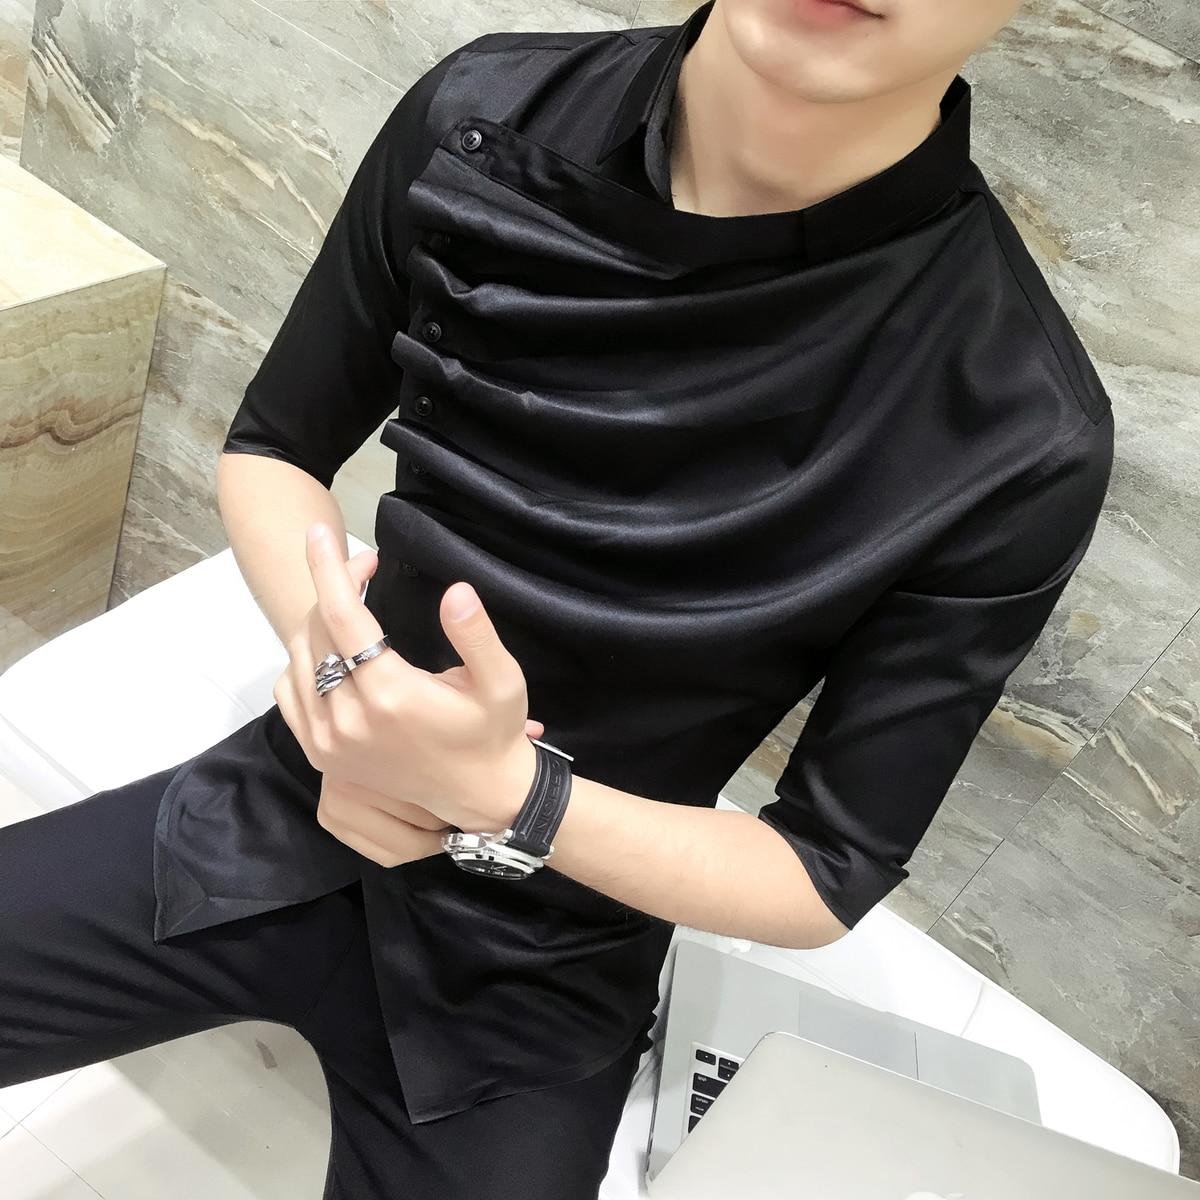 2018 Summer Gothic Shirt Ruffle Designer Collar Shirt Black And White Korean Men Fashion Clothing Prom Party Club Even Shirts